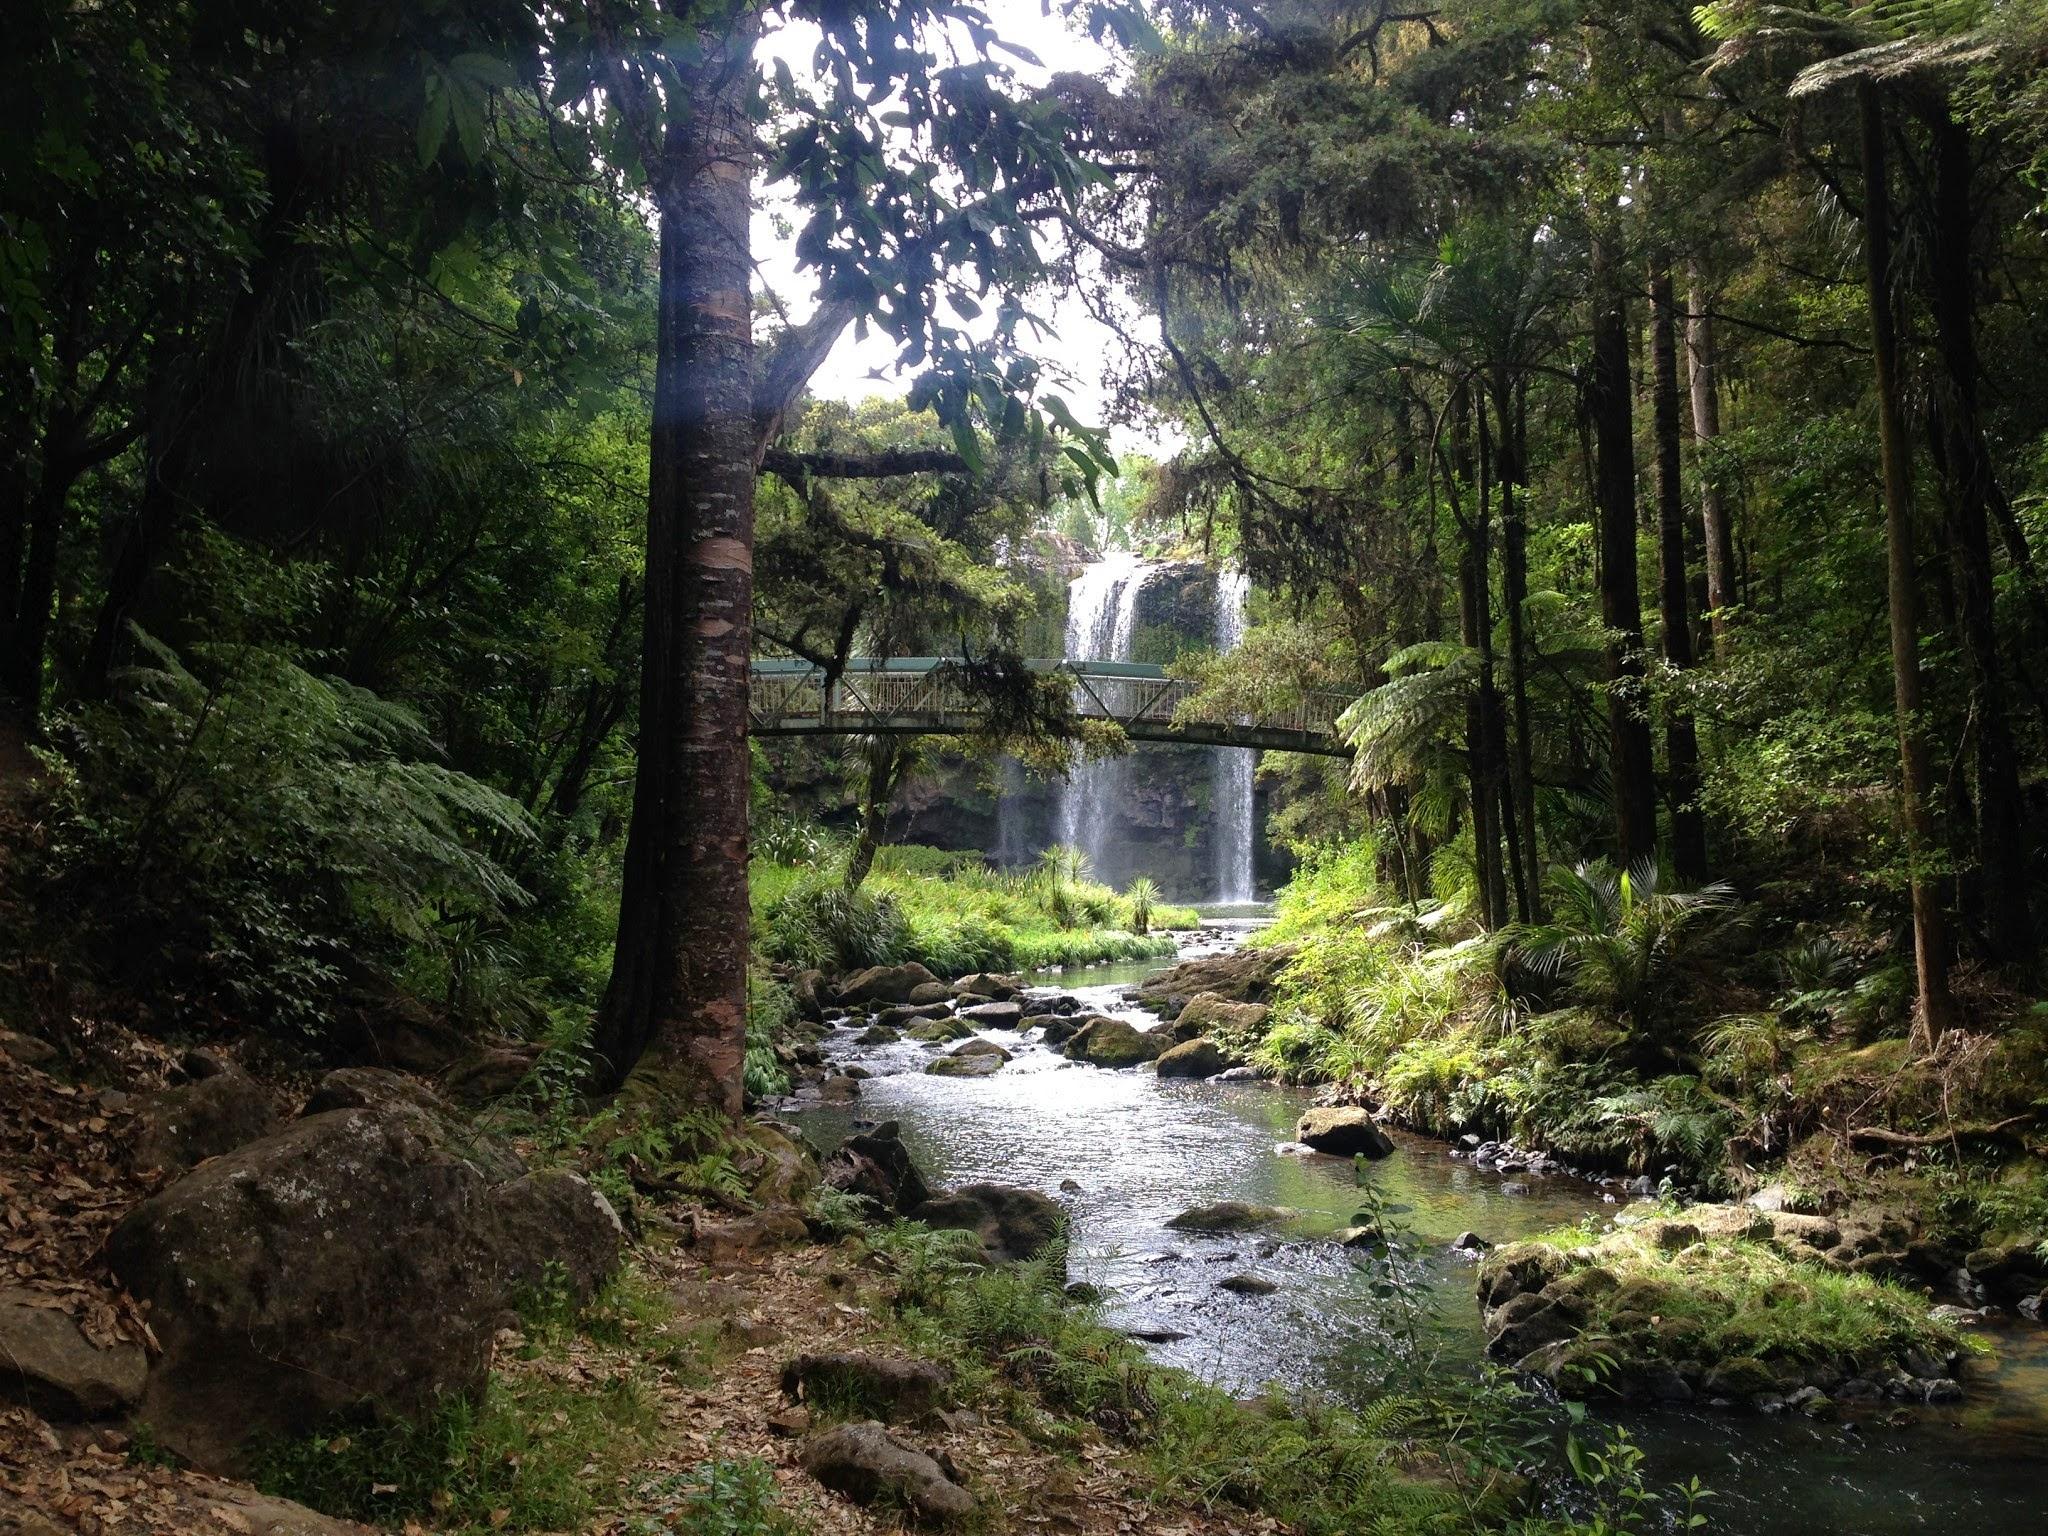 Whangarei, Whangarei Falls, backpacking, travelling, travels, blog, travel blog, Paihia, northland, north island,